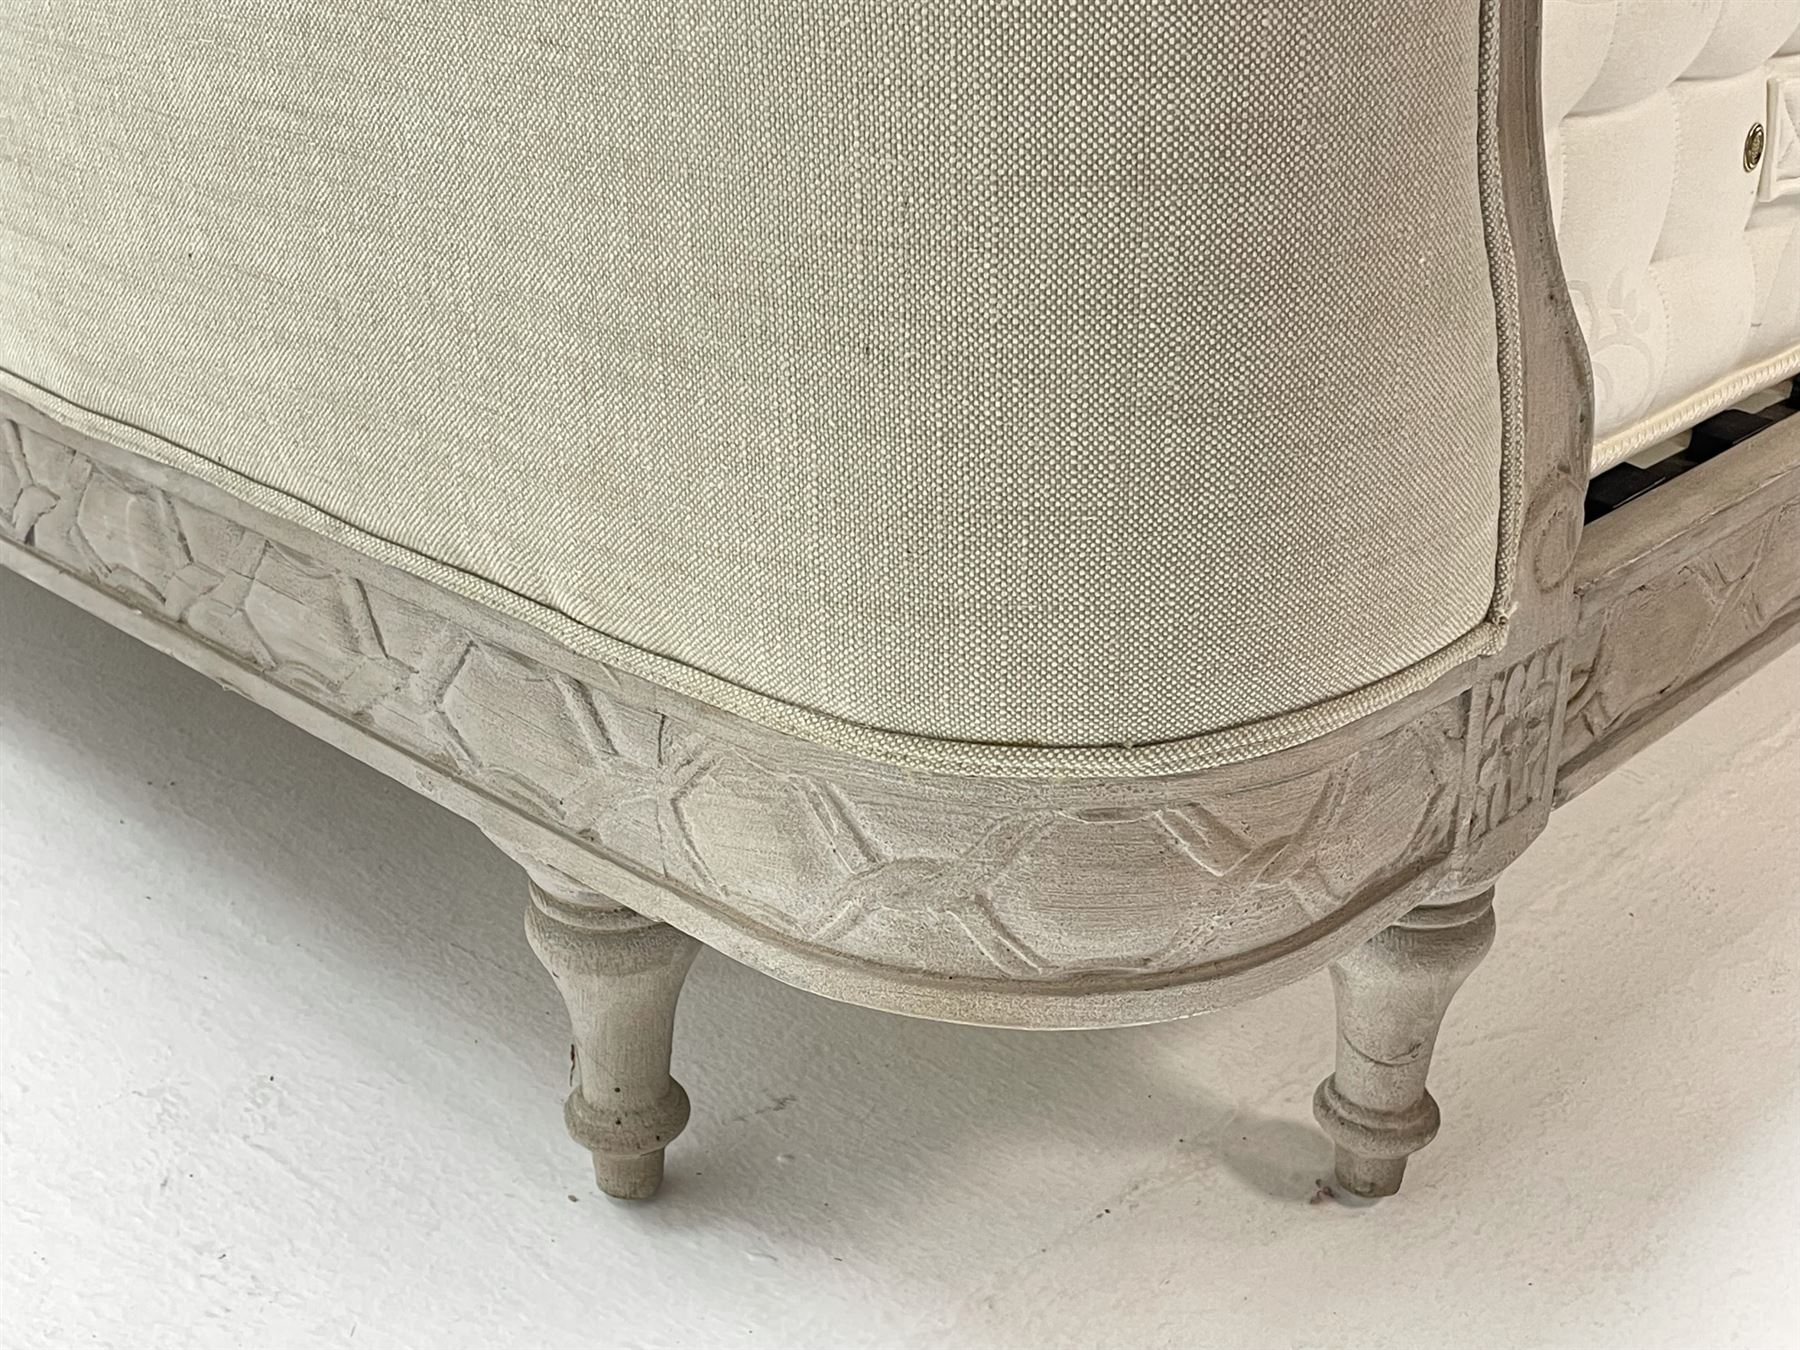 Graham & Green Evelyn - French style Kingsize 5' bedstead upholstered in natural light grey linen - Image 5 of 6